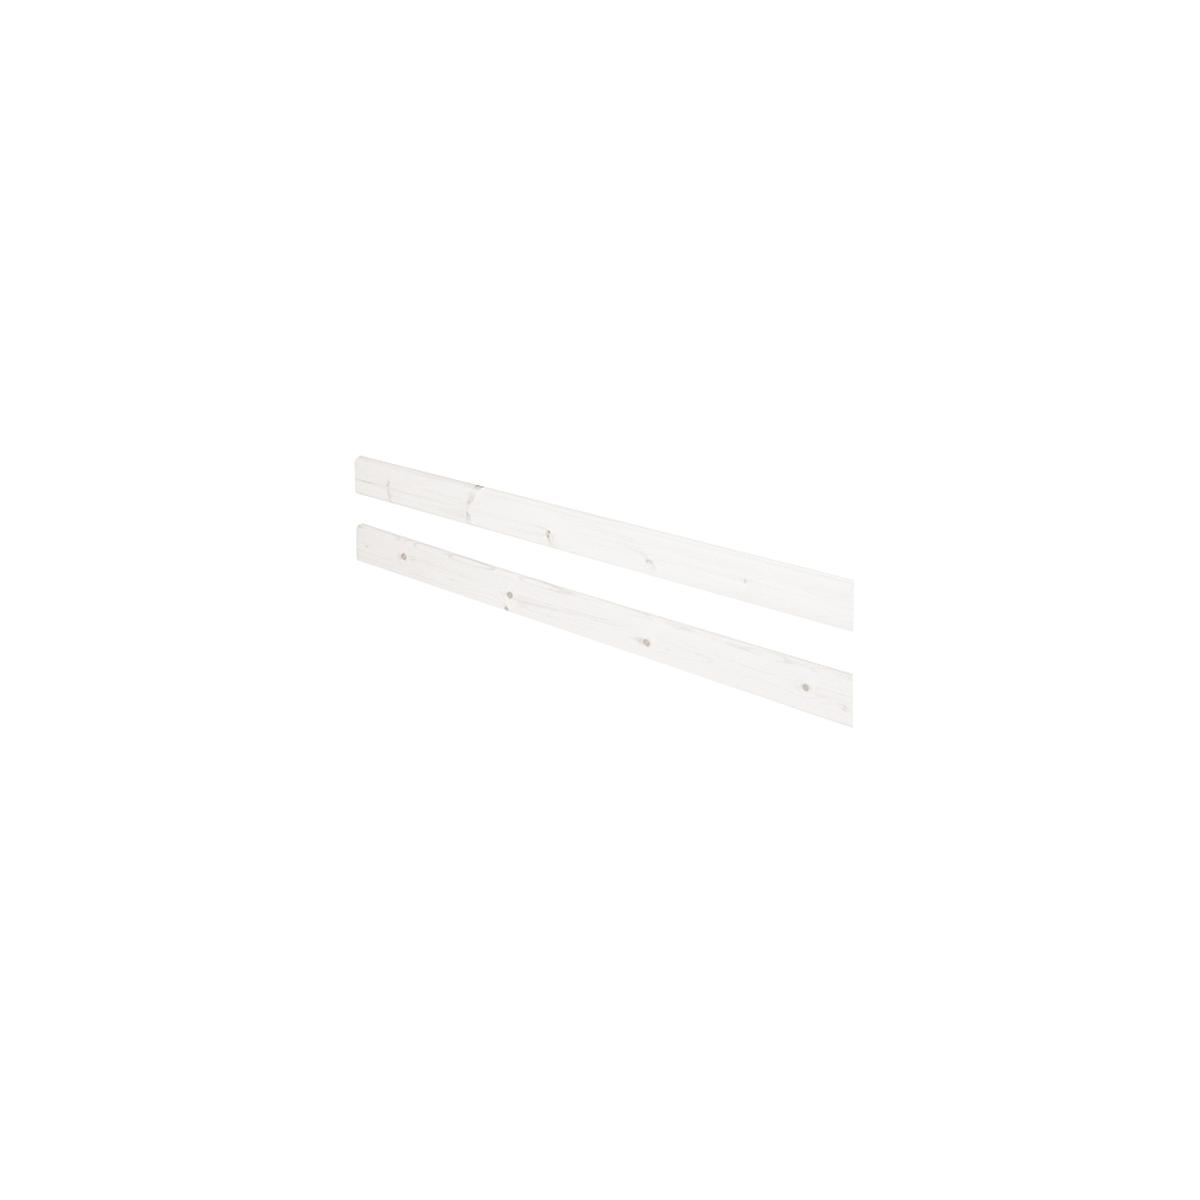 Barrera posterior Cama 200cm CLASSIC Flexa blanco cal